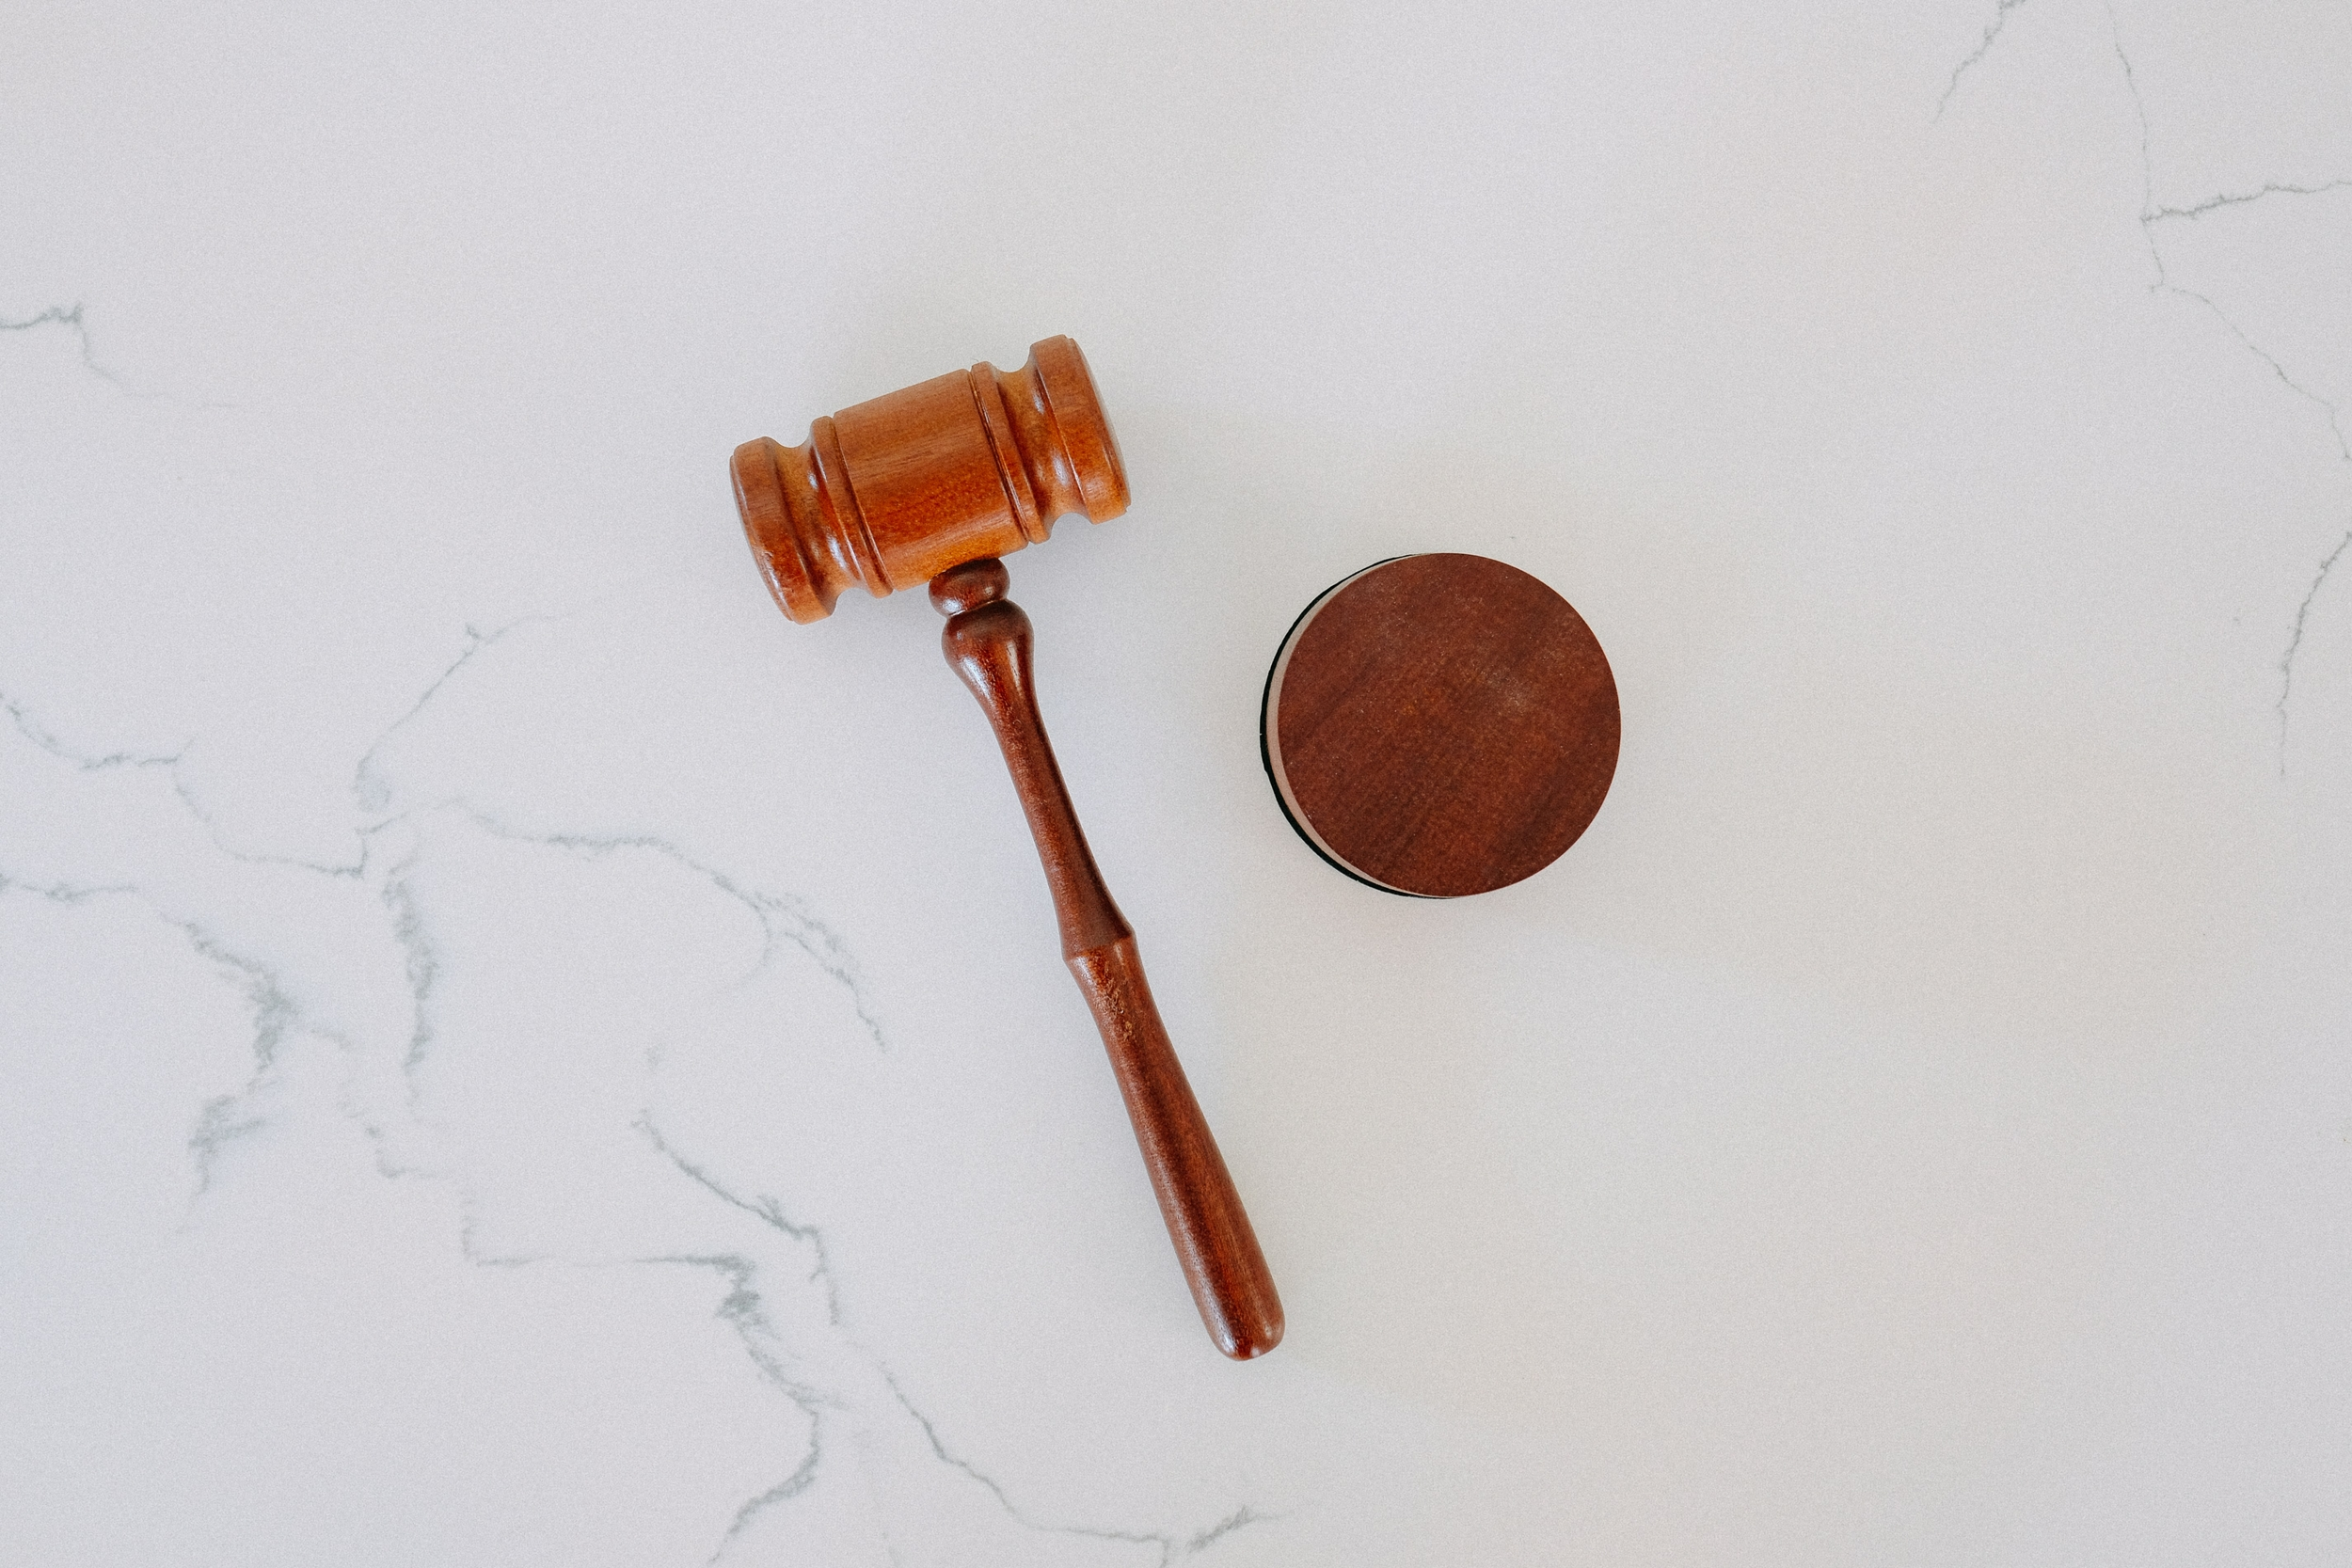 tingey injury law firm 6sl88x150xs unsplash